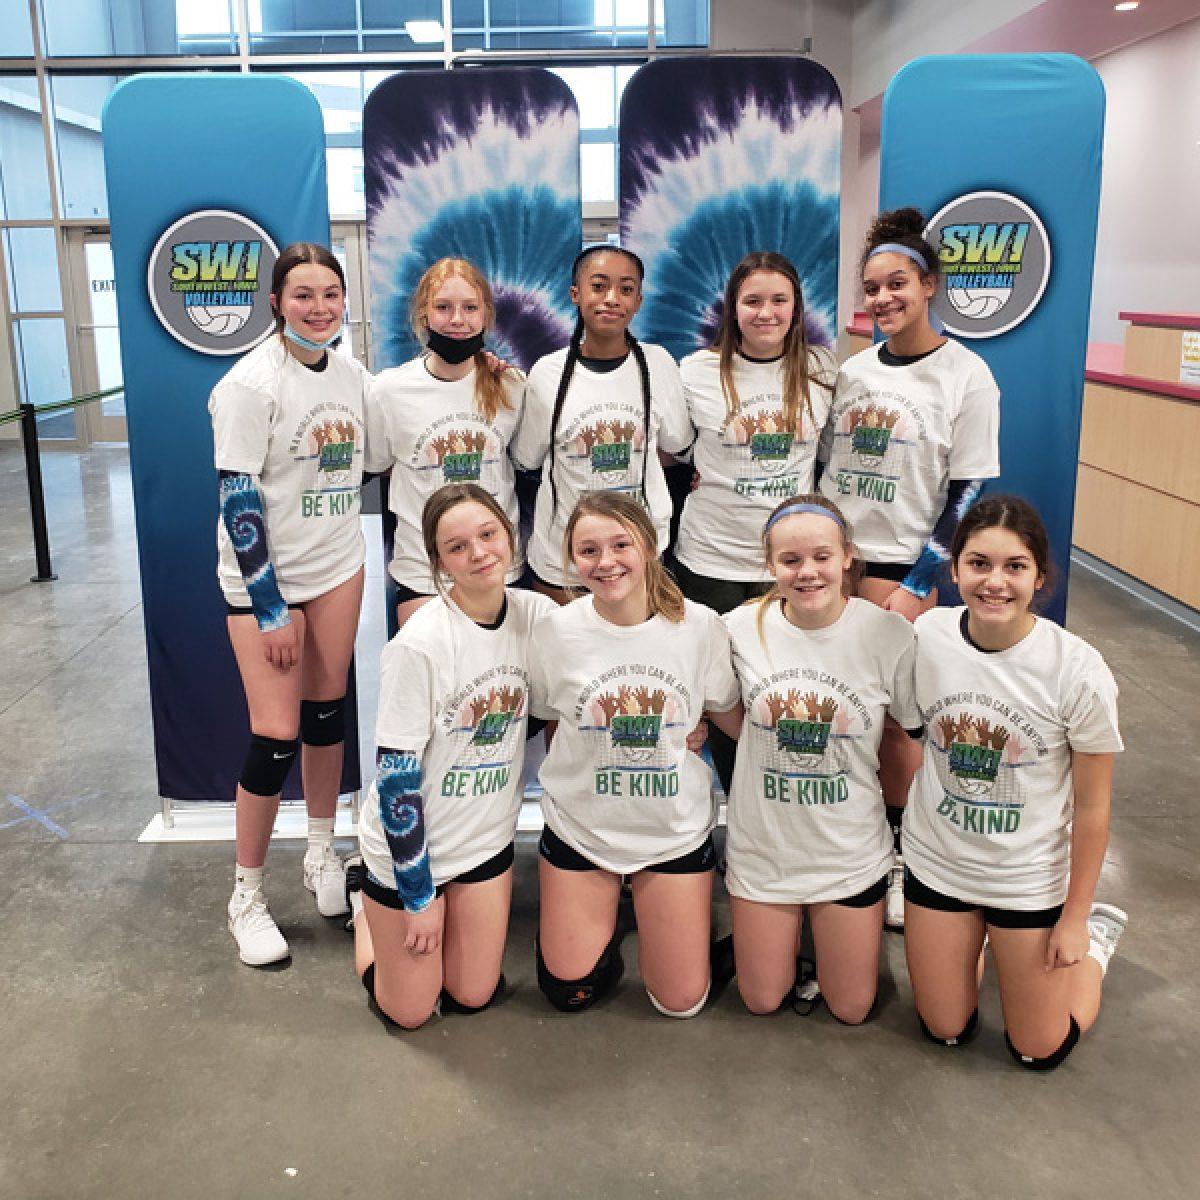 40) SWI Volleyball